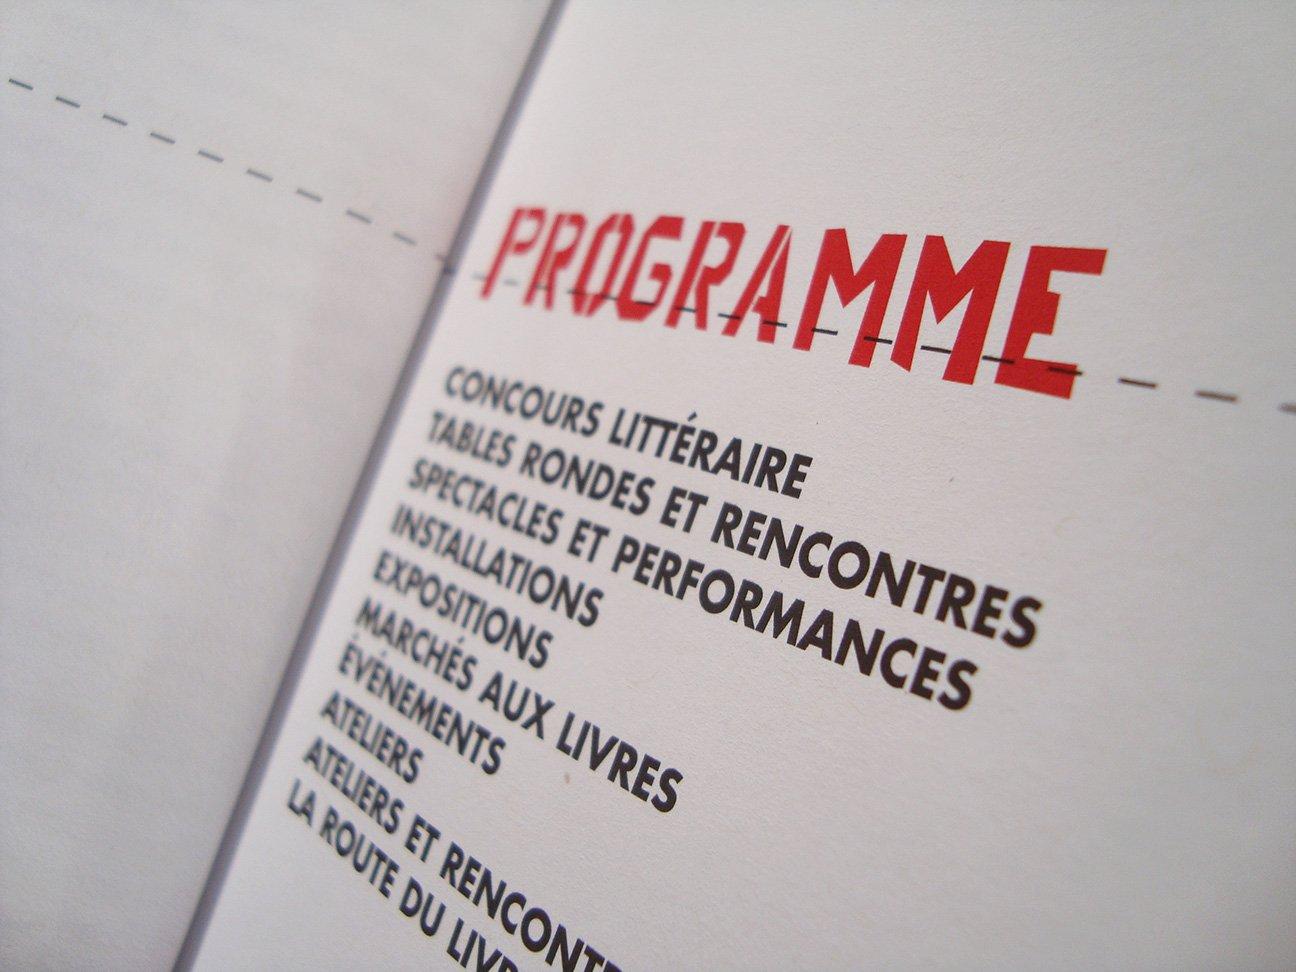 fabien_cuffel_book_festival_litteraire_fureur_lire_2009_4